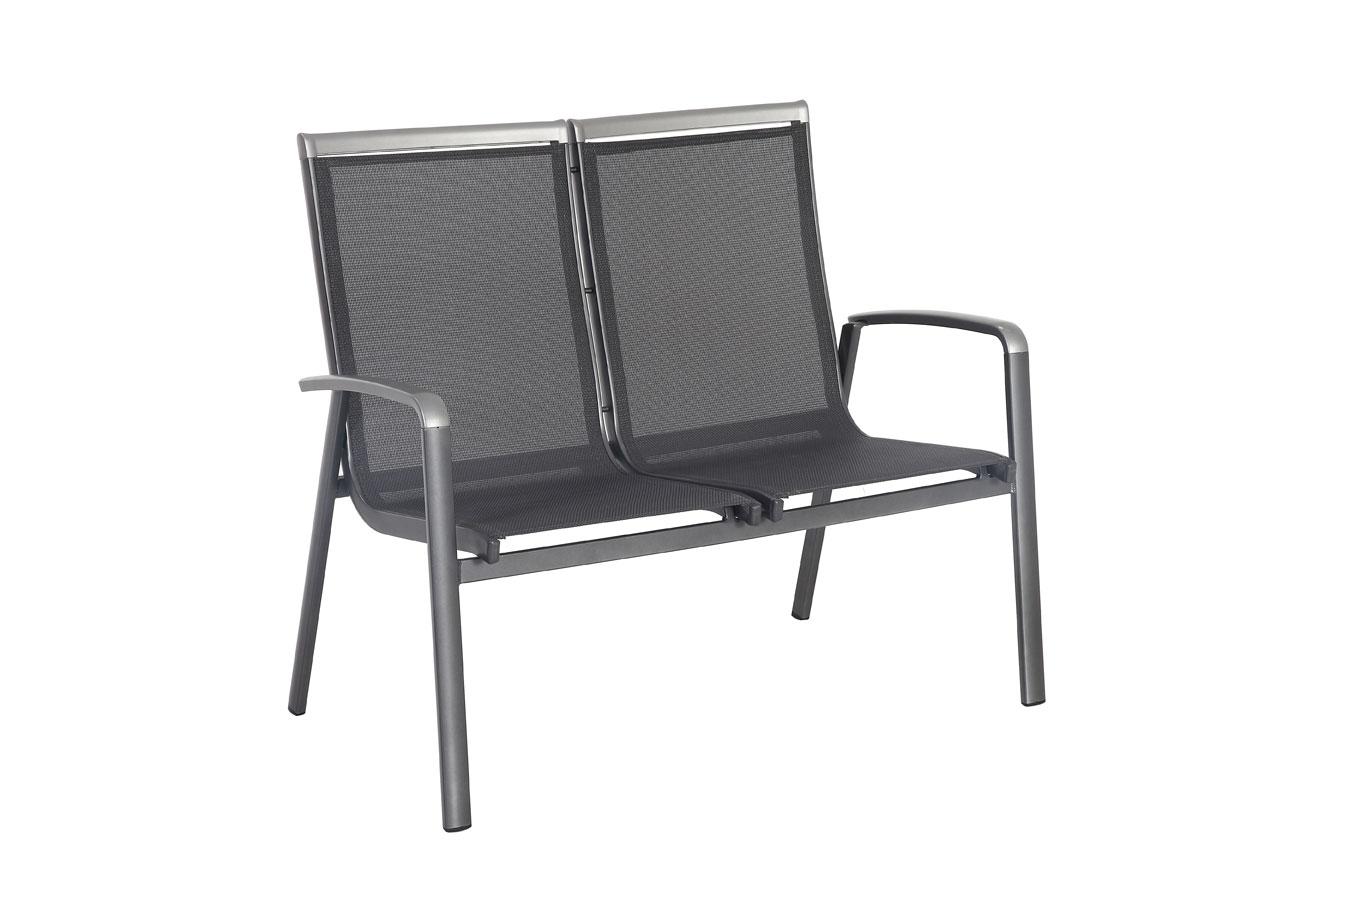 gartenbank metall 2 sitzer best sitzerbank in modern with. Black Bedroom Furniture Sets. Home Design Ideas